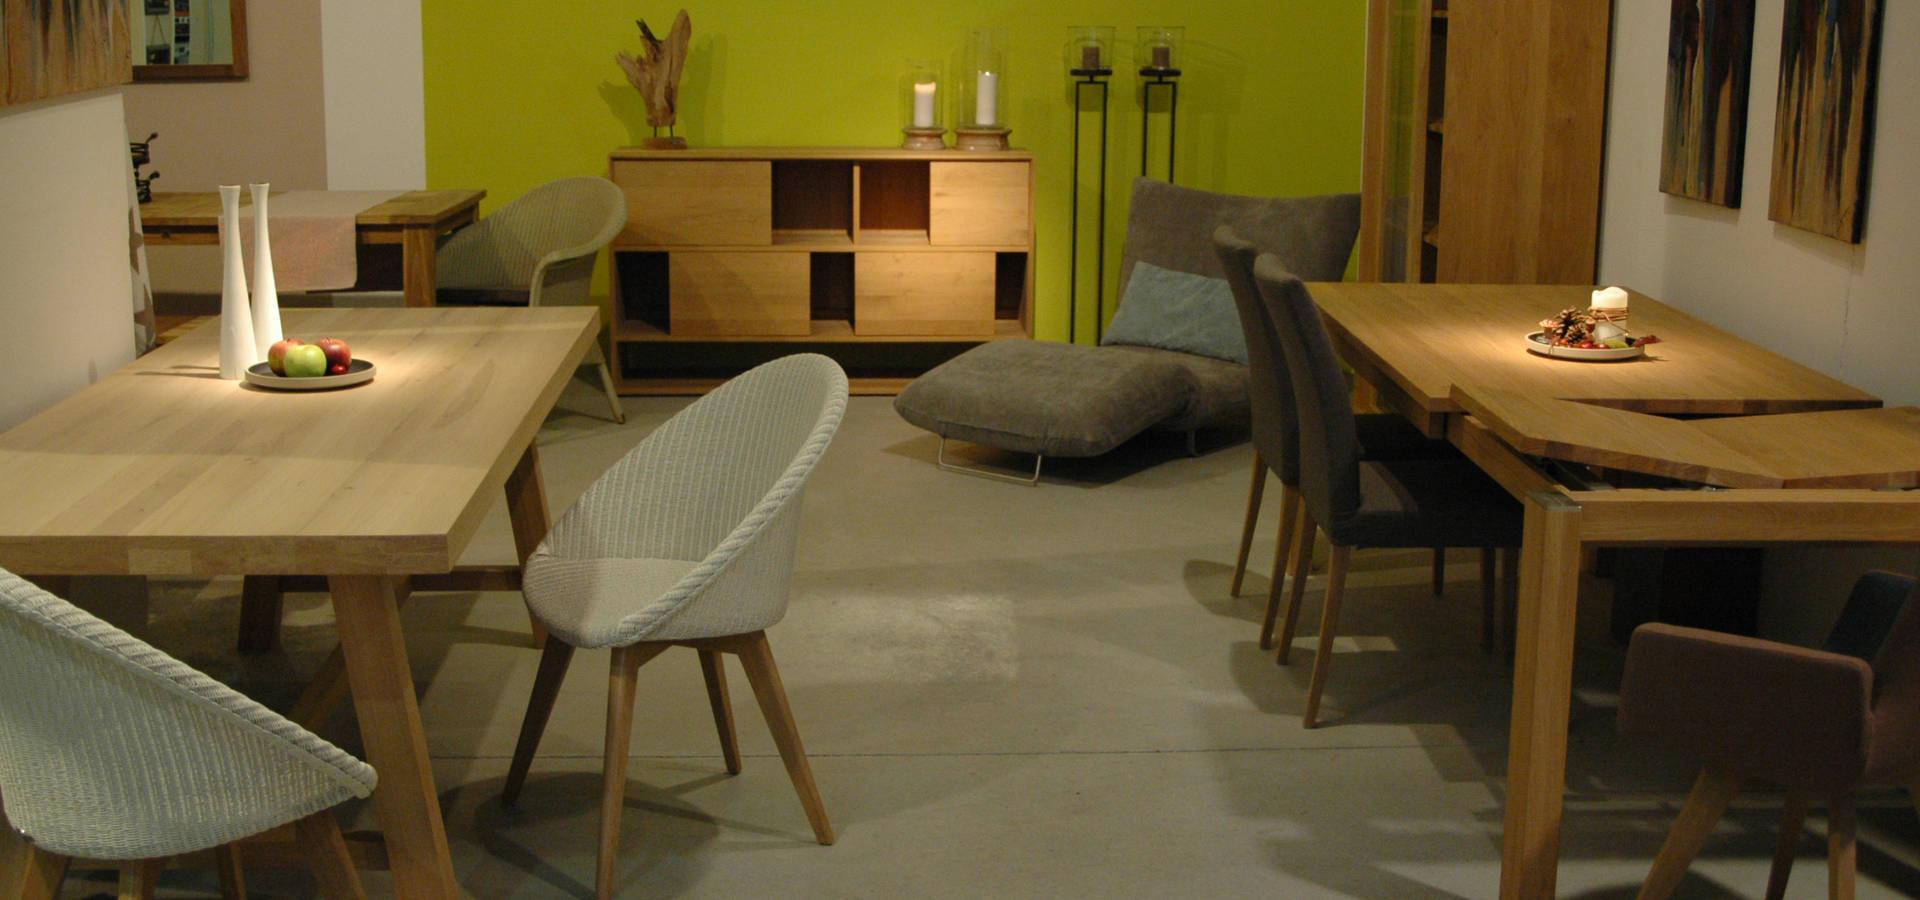 room garden gmbh esstische massivholzm bel homify. Black Bedroom Furniture Sets. Home Design Ideas